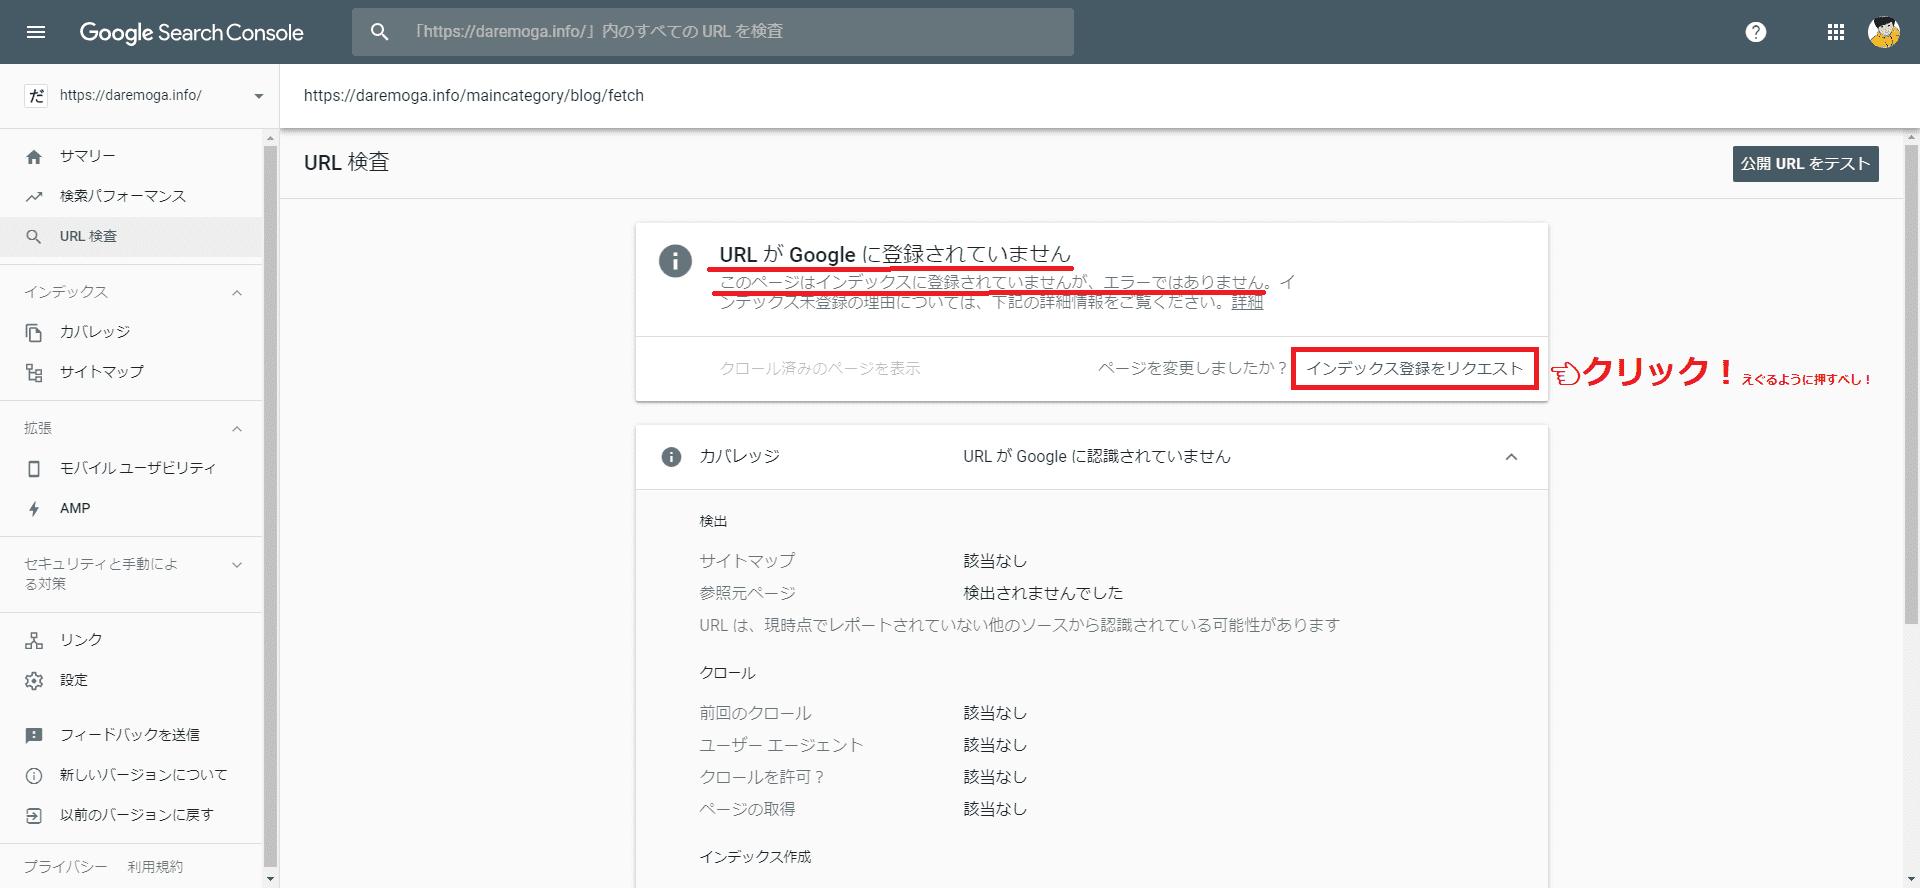 URL未登録